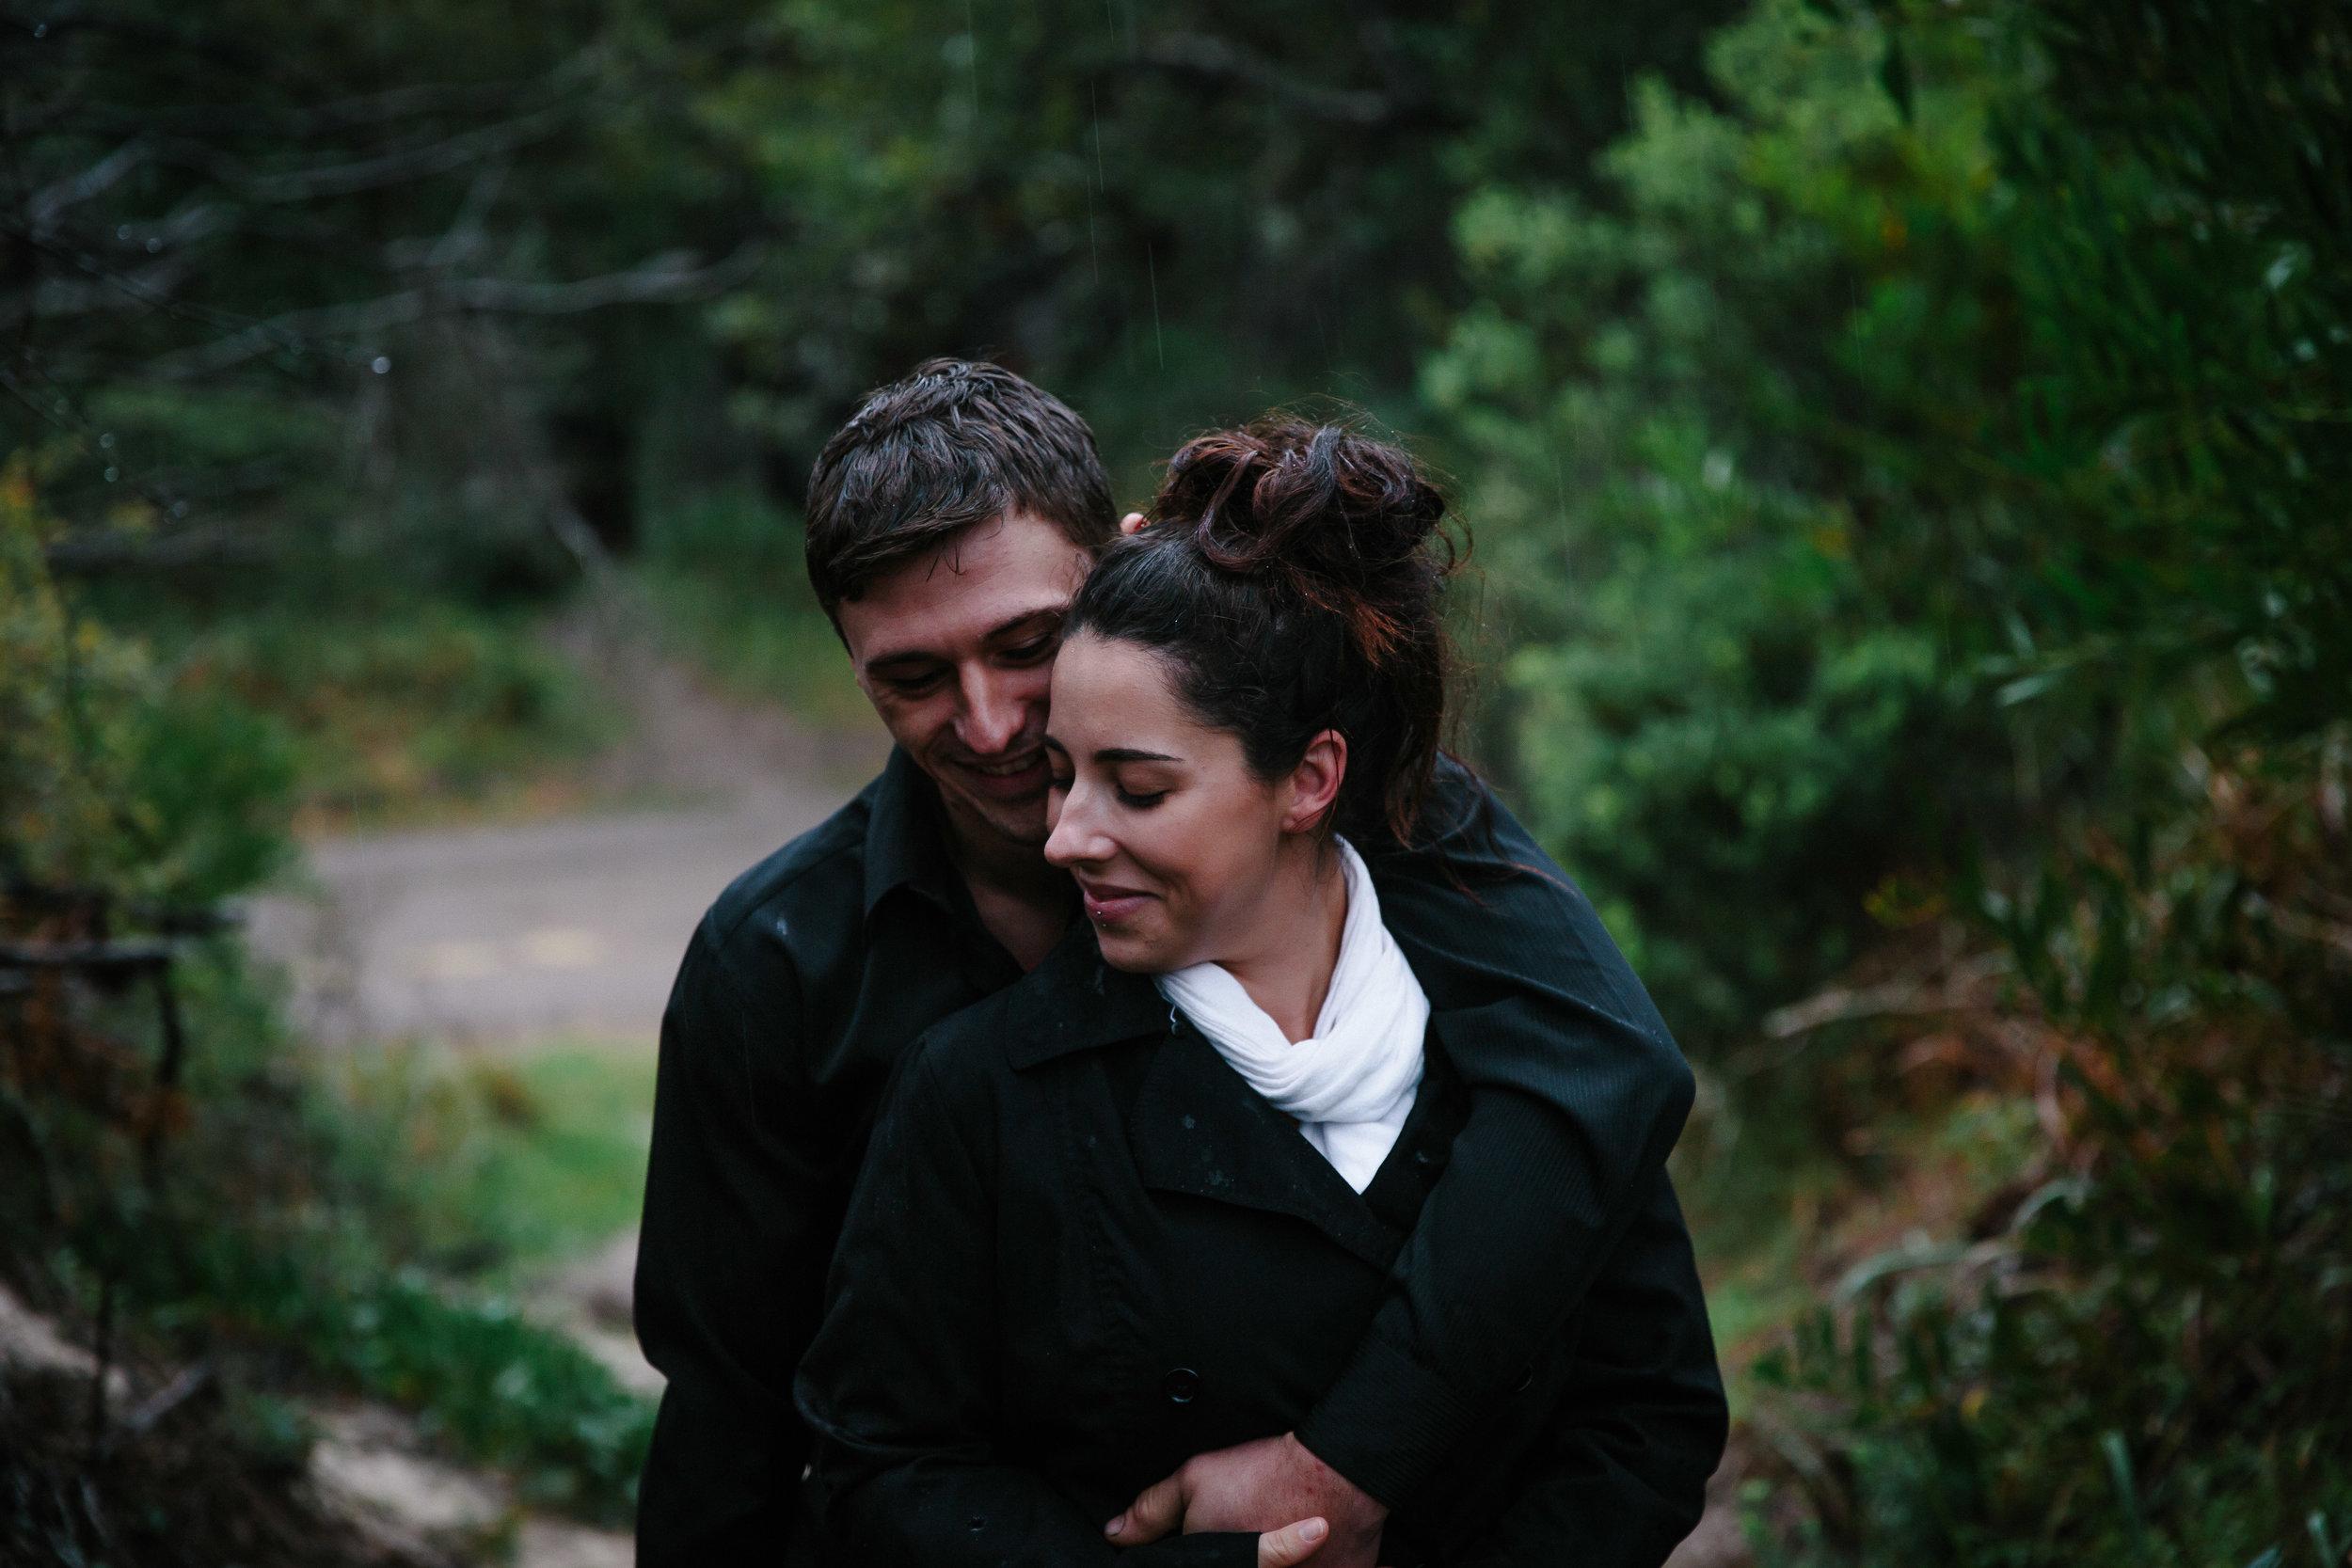 Hawks Nest Engagement Photography